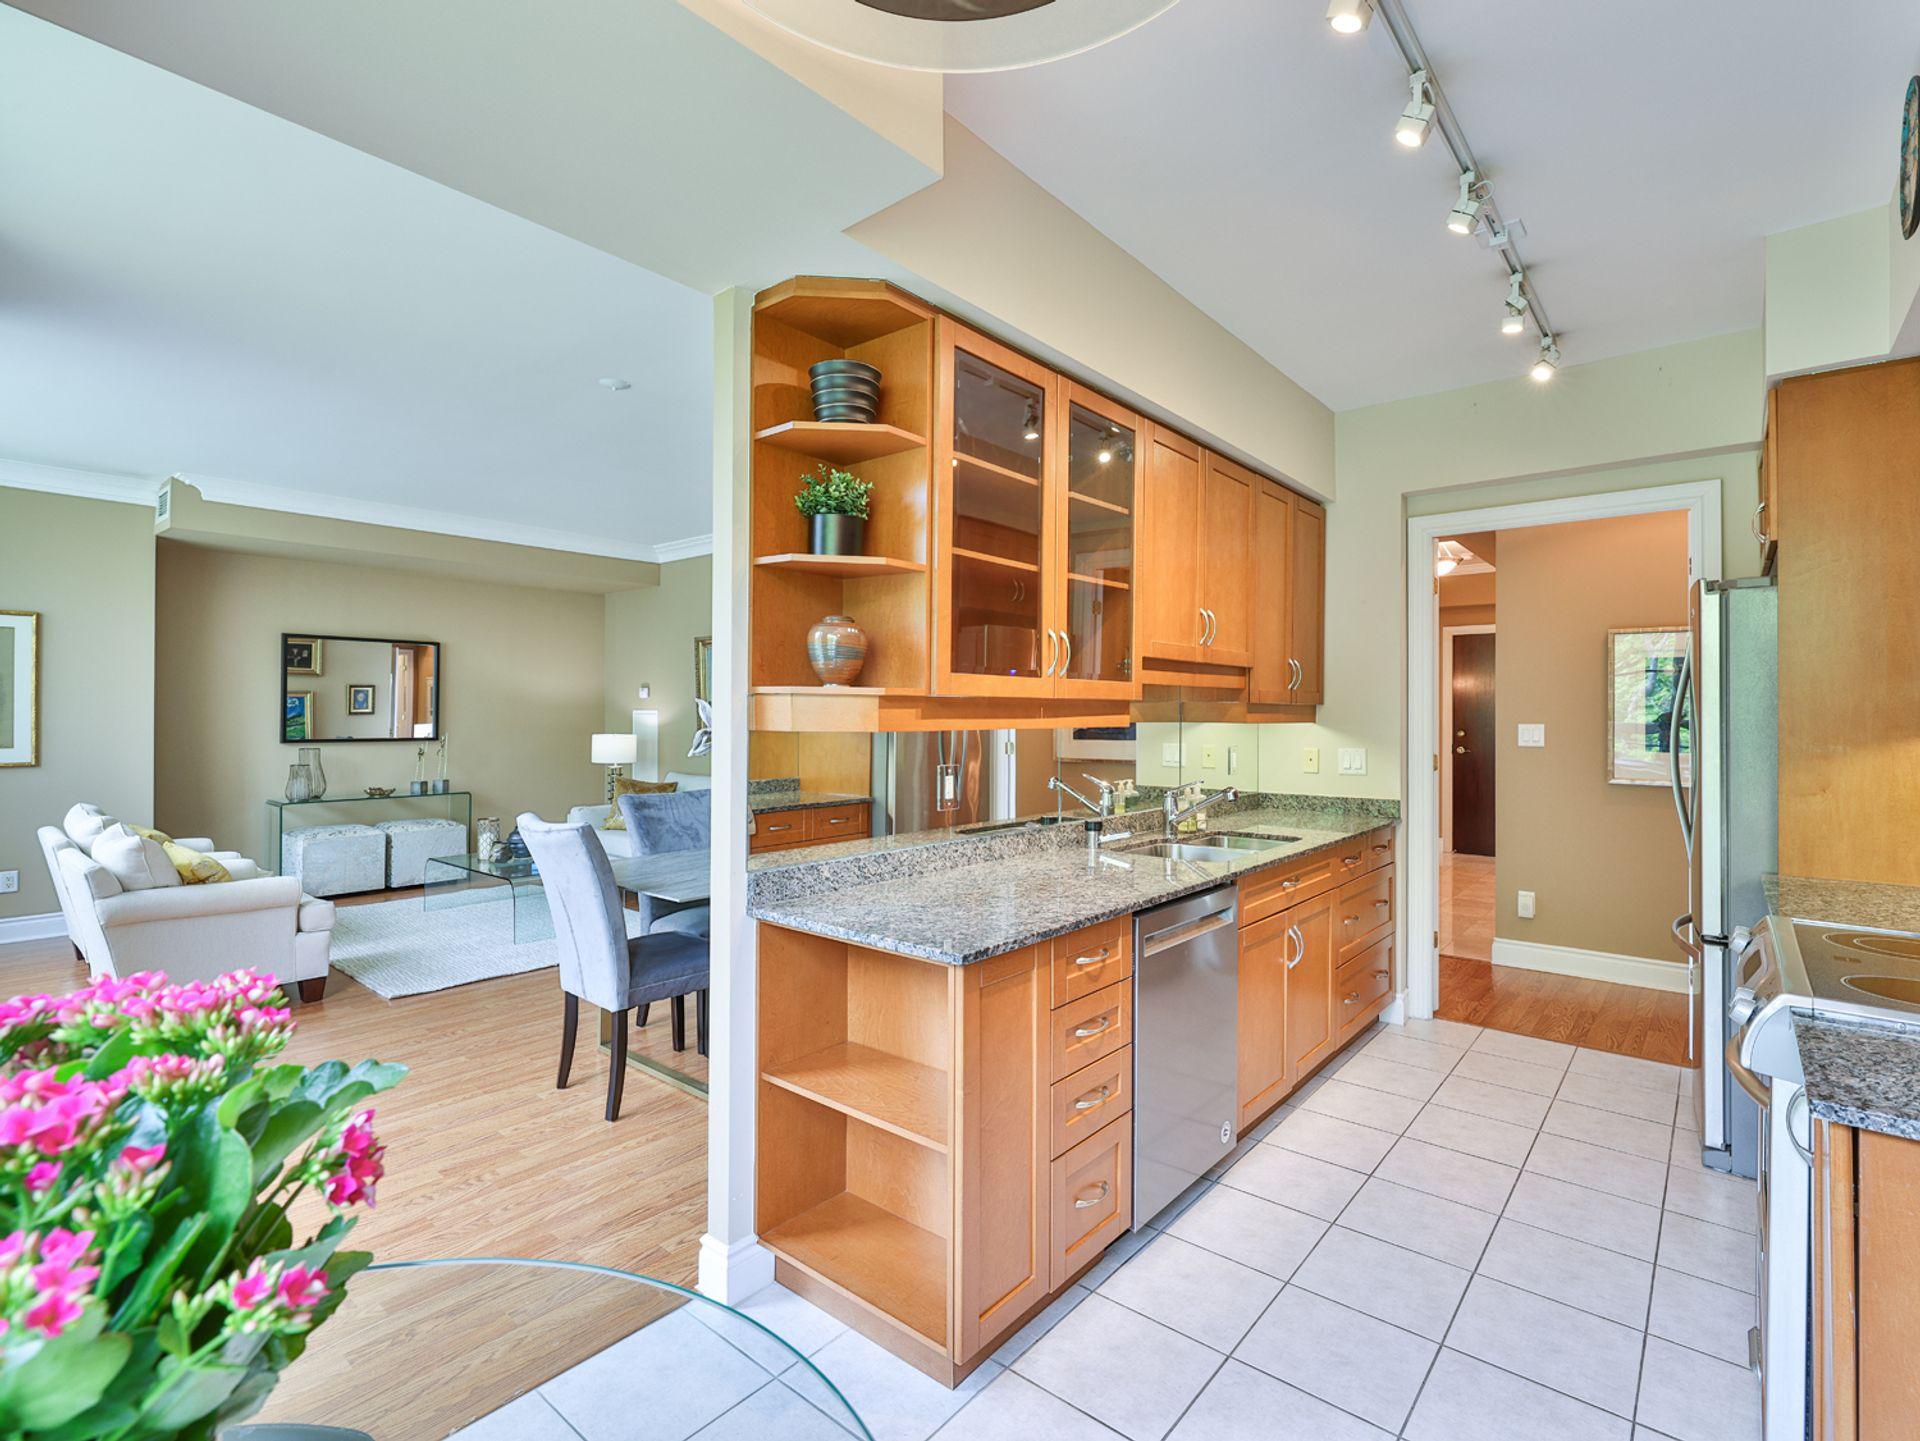 Kitchen at 914 - 38 William Carson Crescent, St. Andrew-Windfields, Toronto